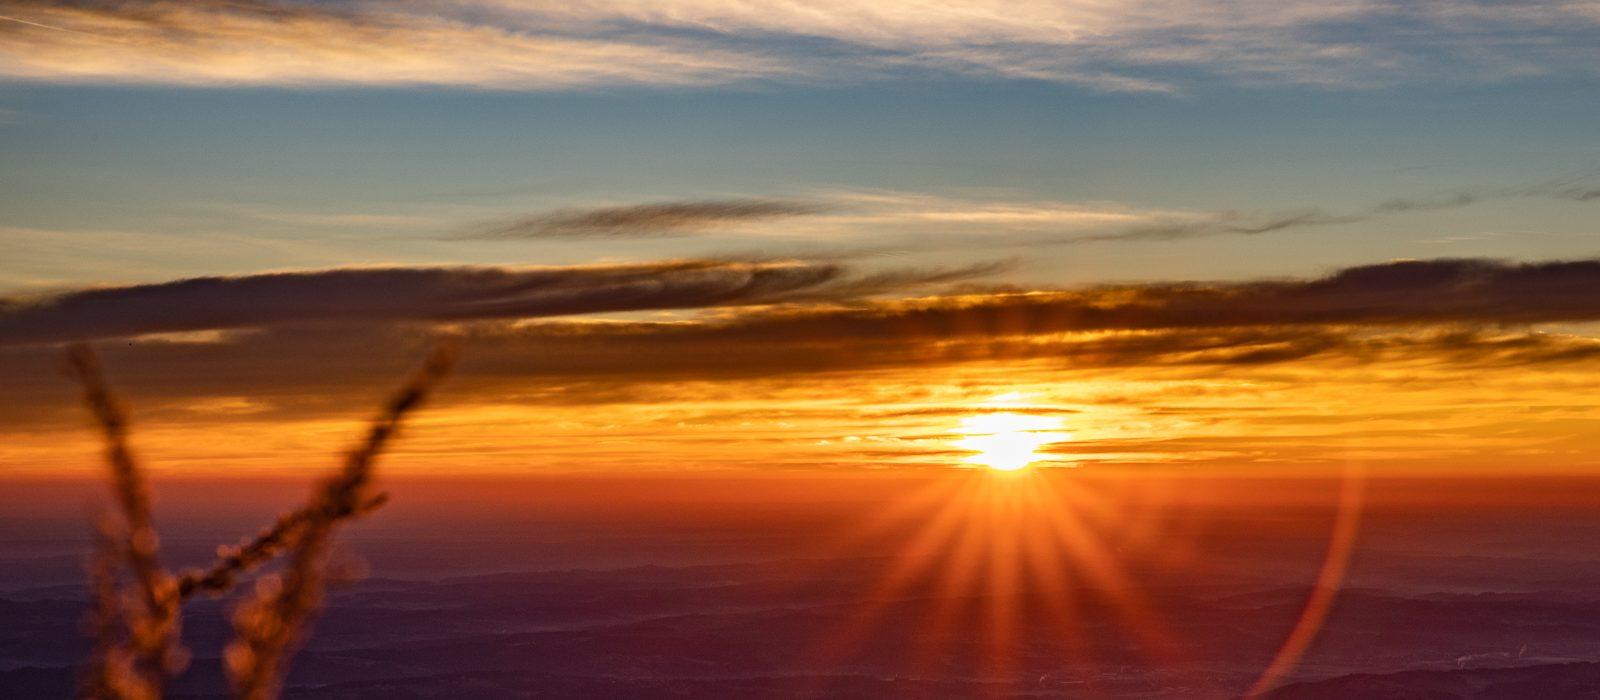 Sonnenaufgang   fotomontag   Norbert Eder Photography